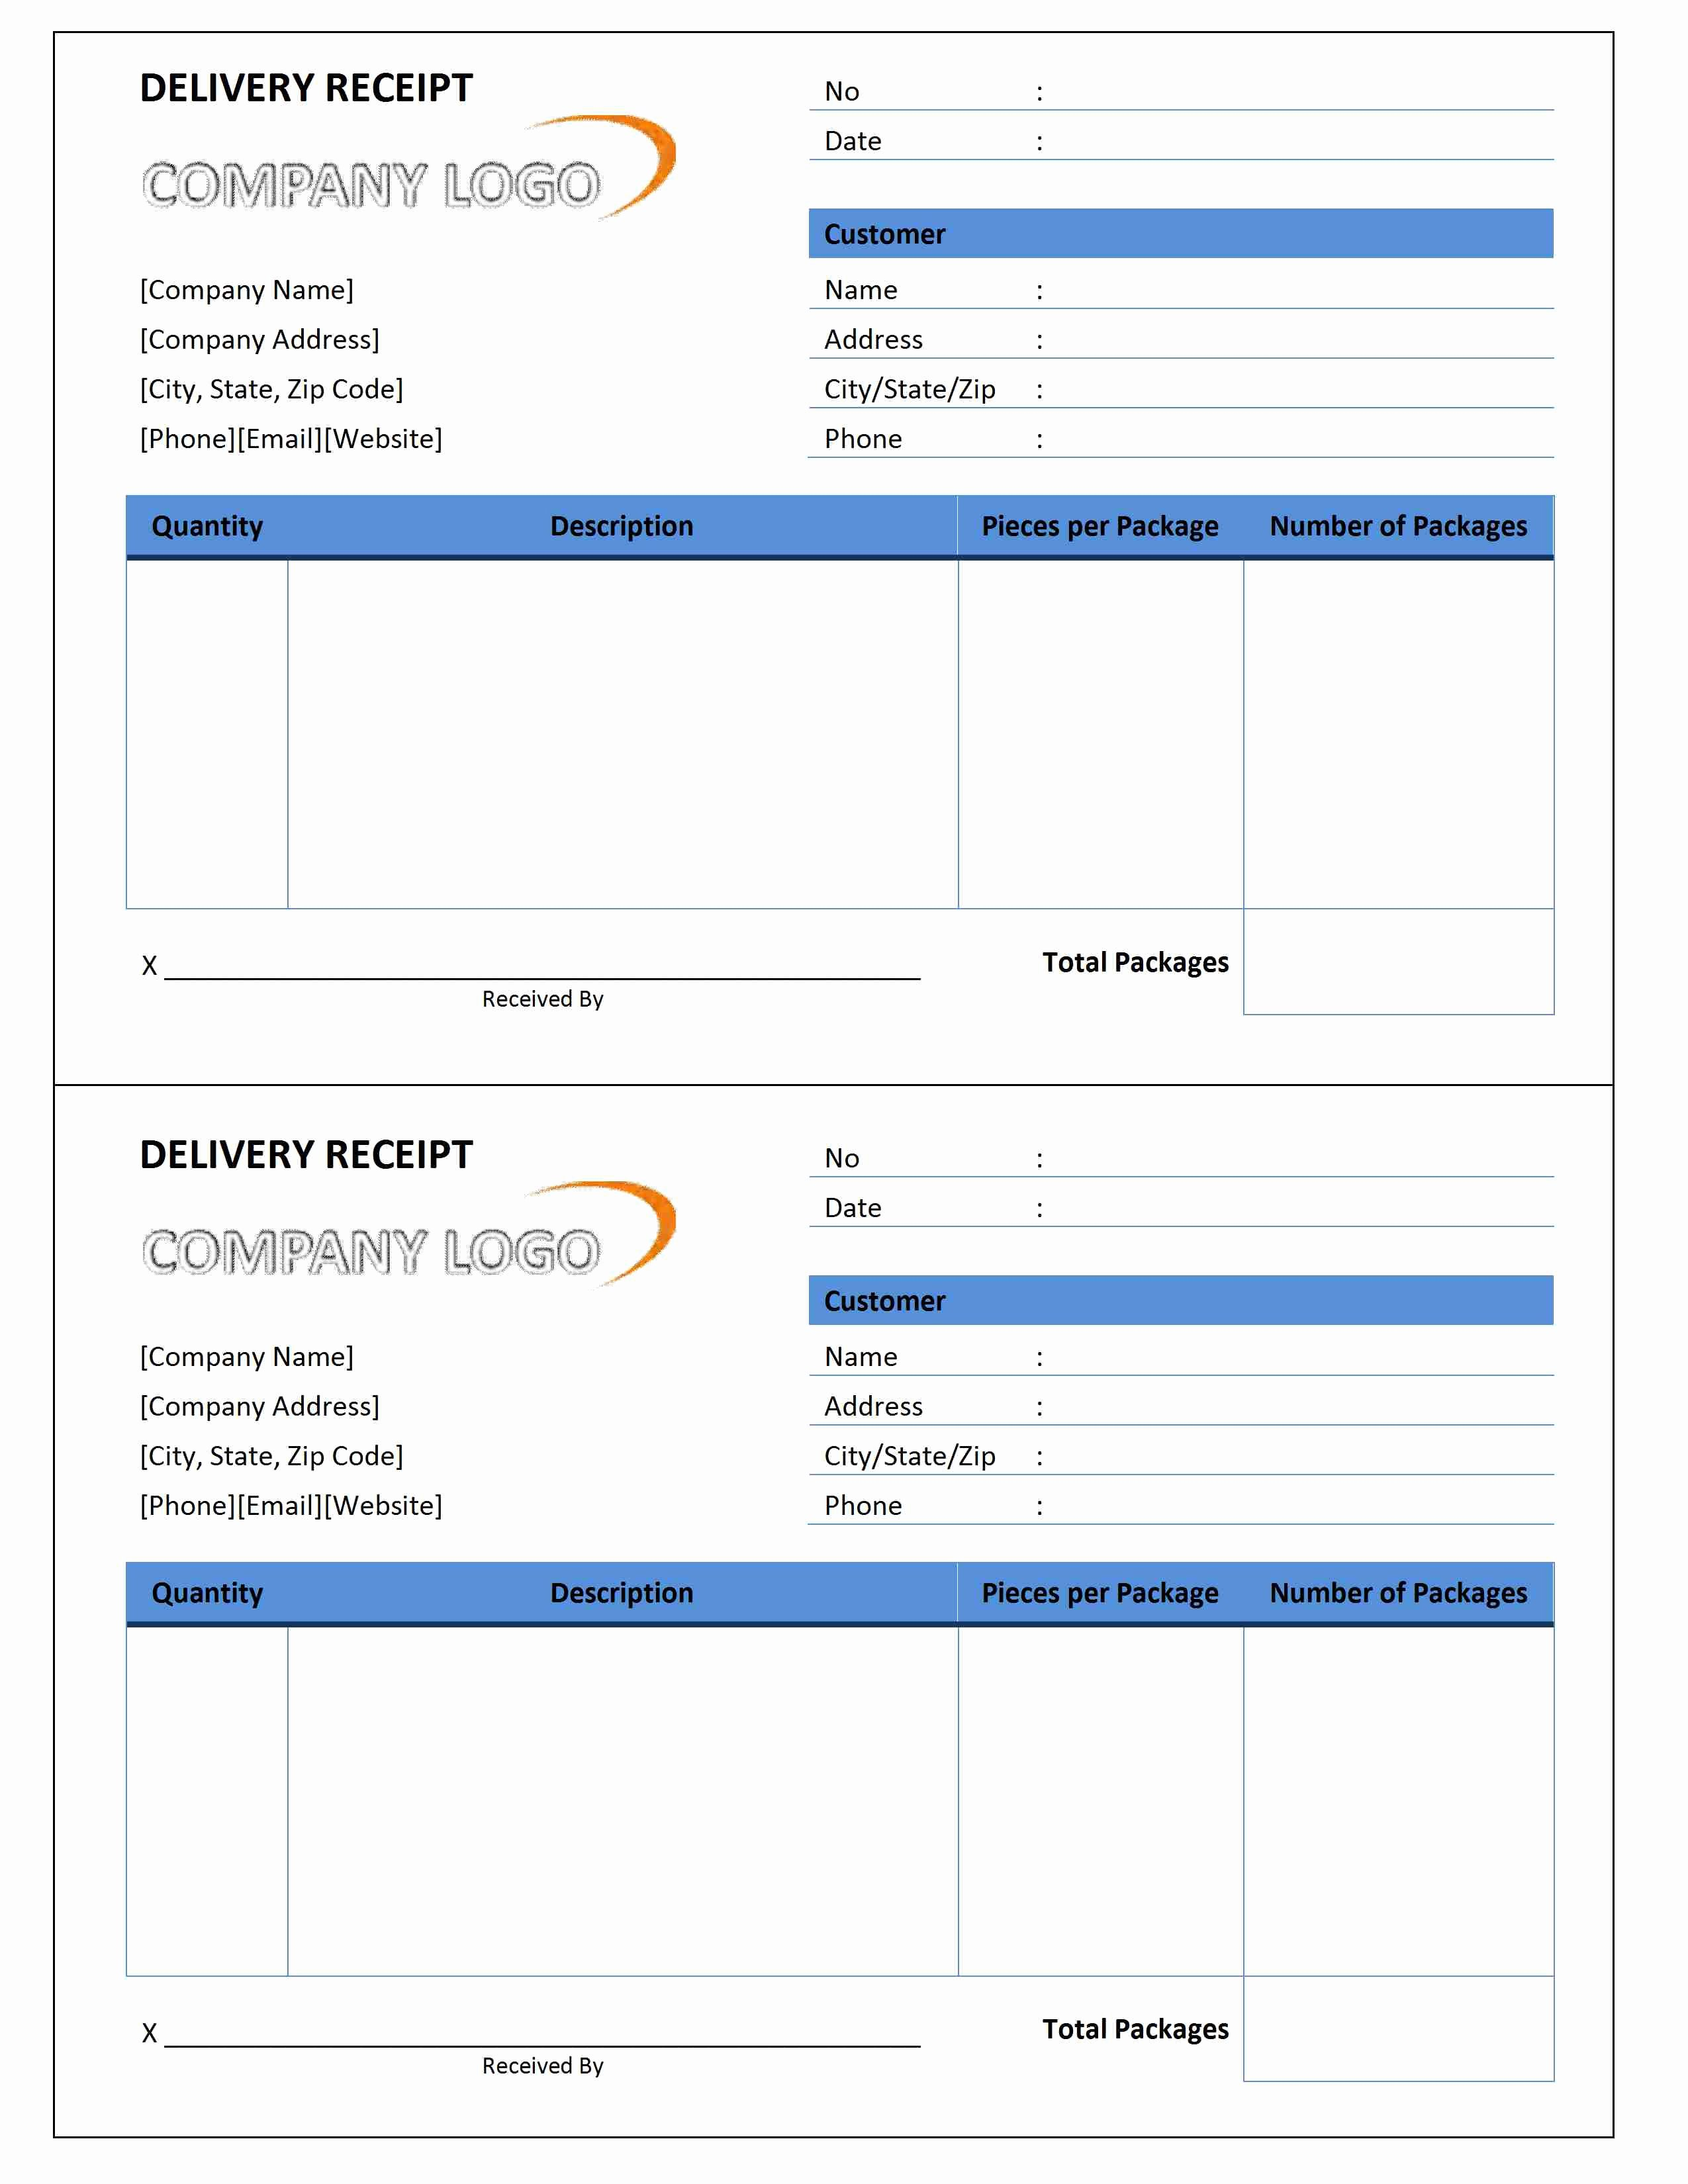 Best Buy Receipt Template Elegant top 10 Free Receipt Templates for Microsoft Word